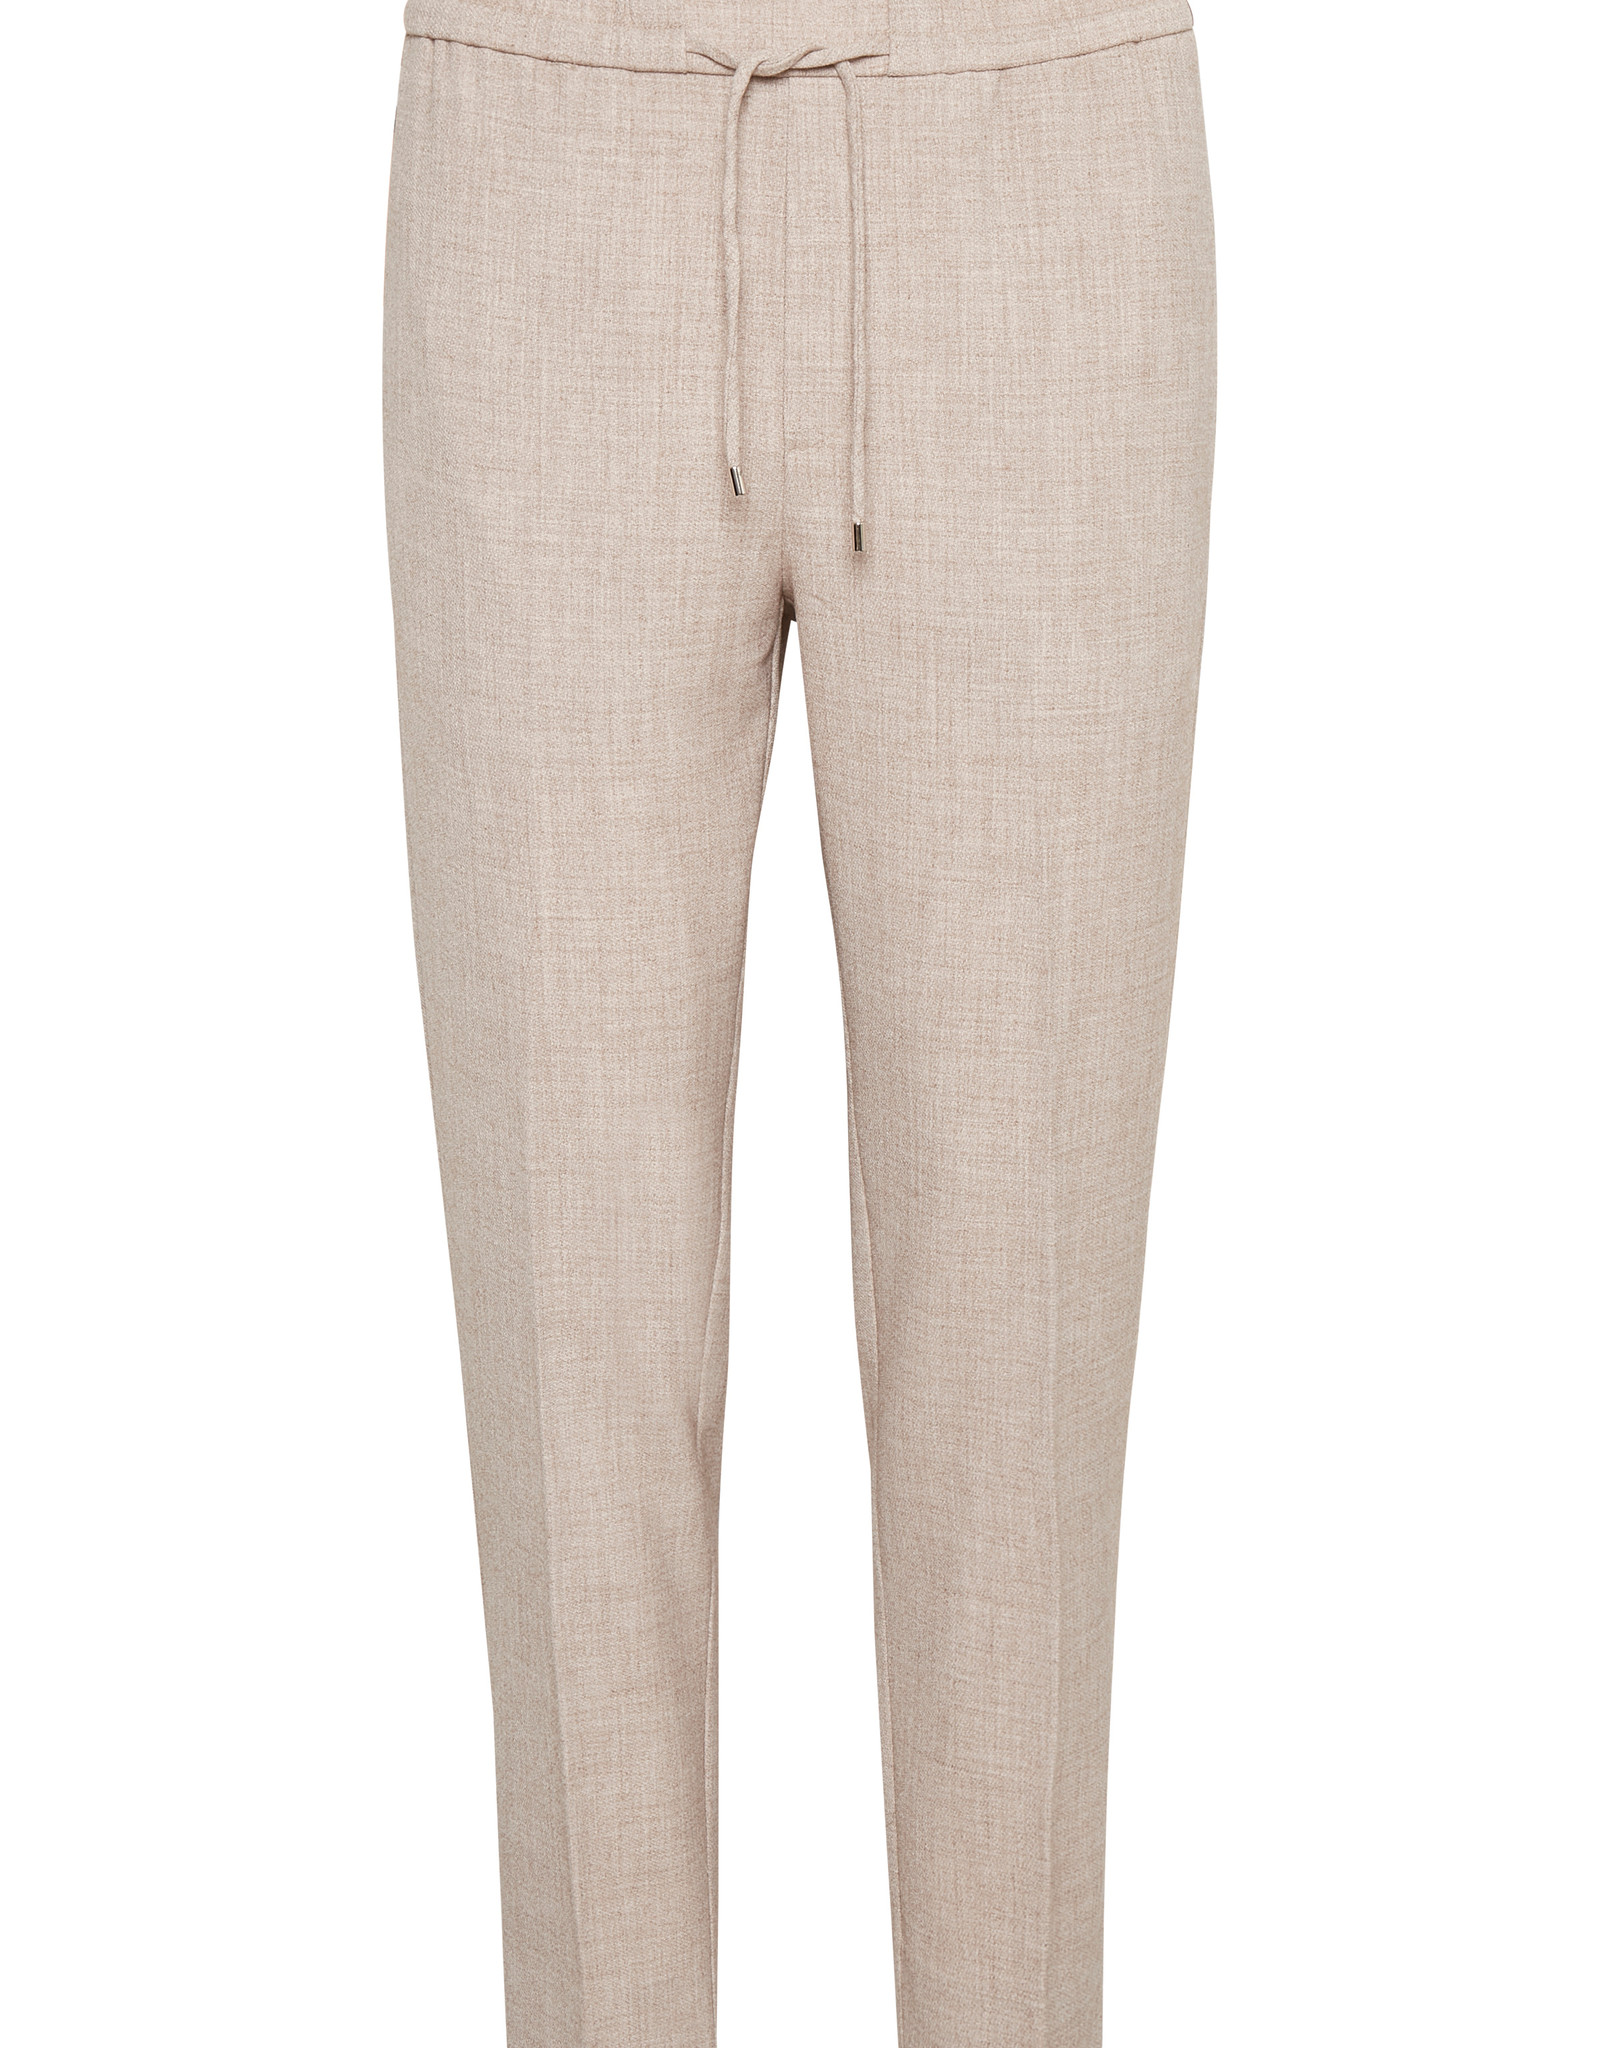 InWear Cadina Pull-On Pant Oatmeal Melange